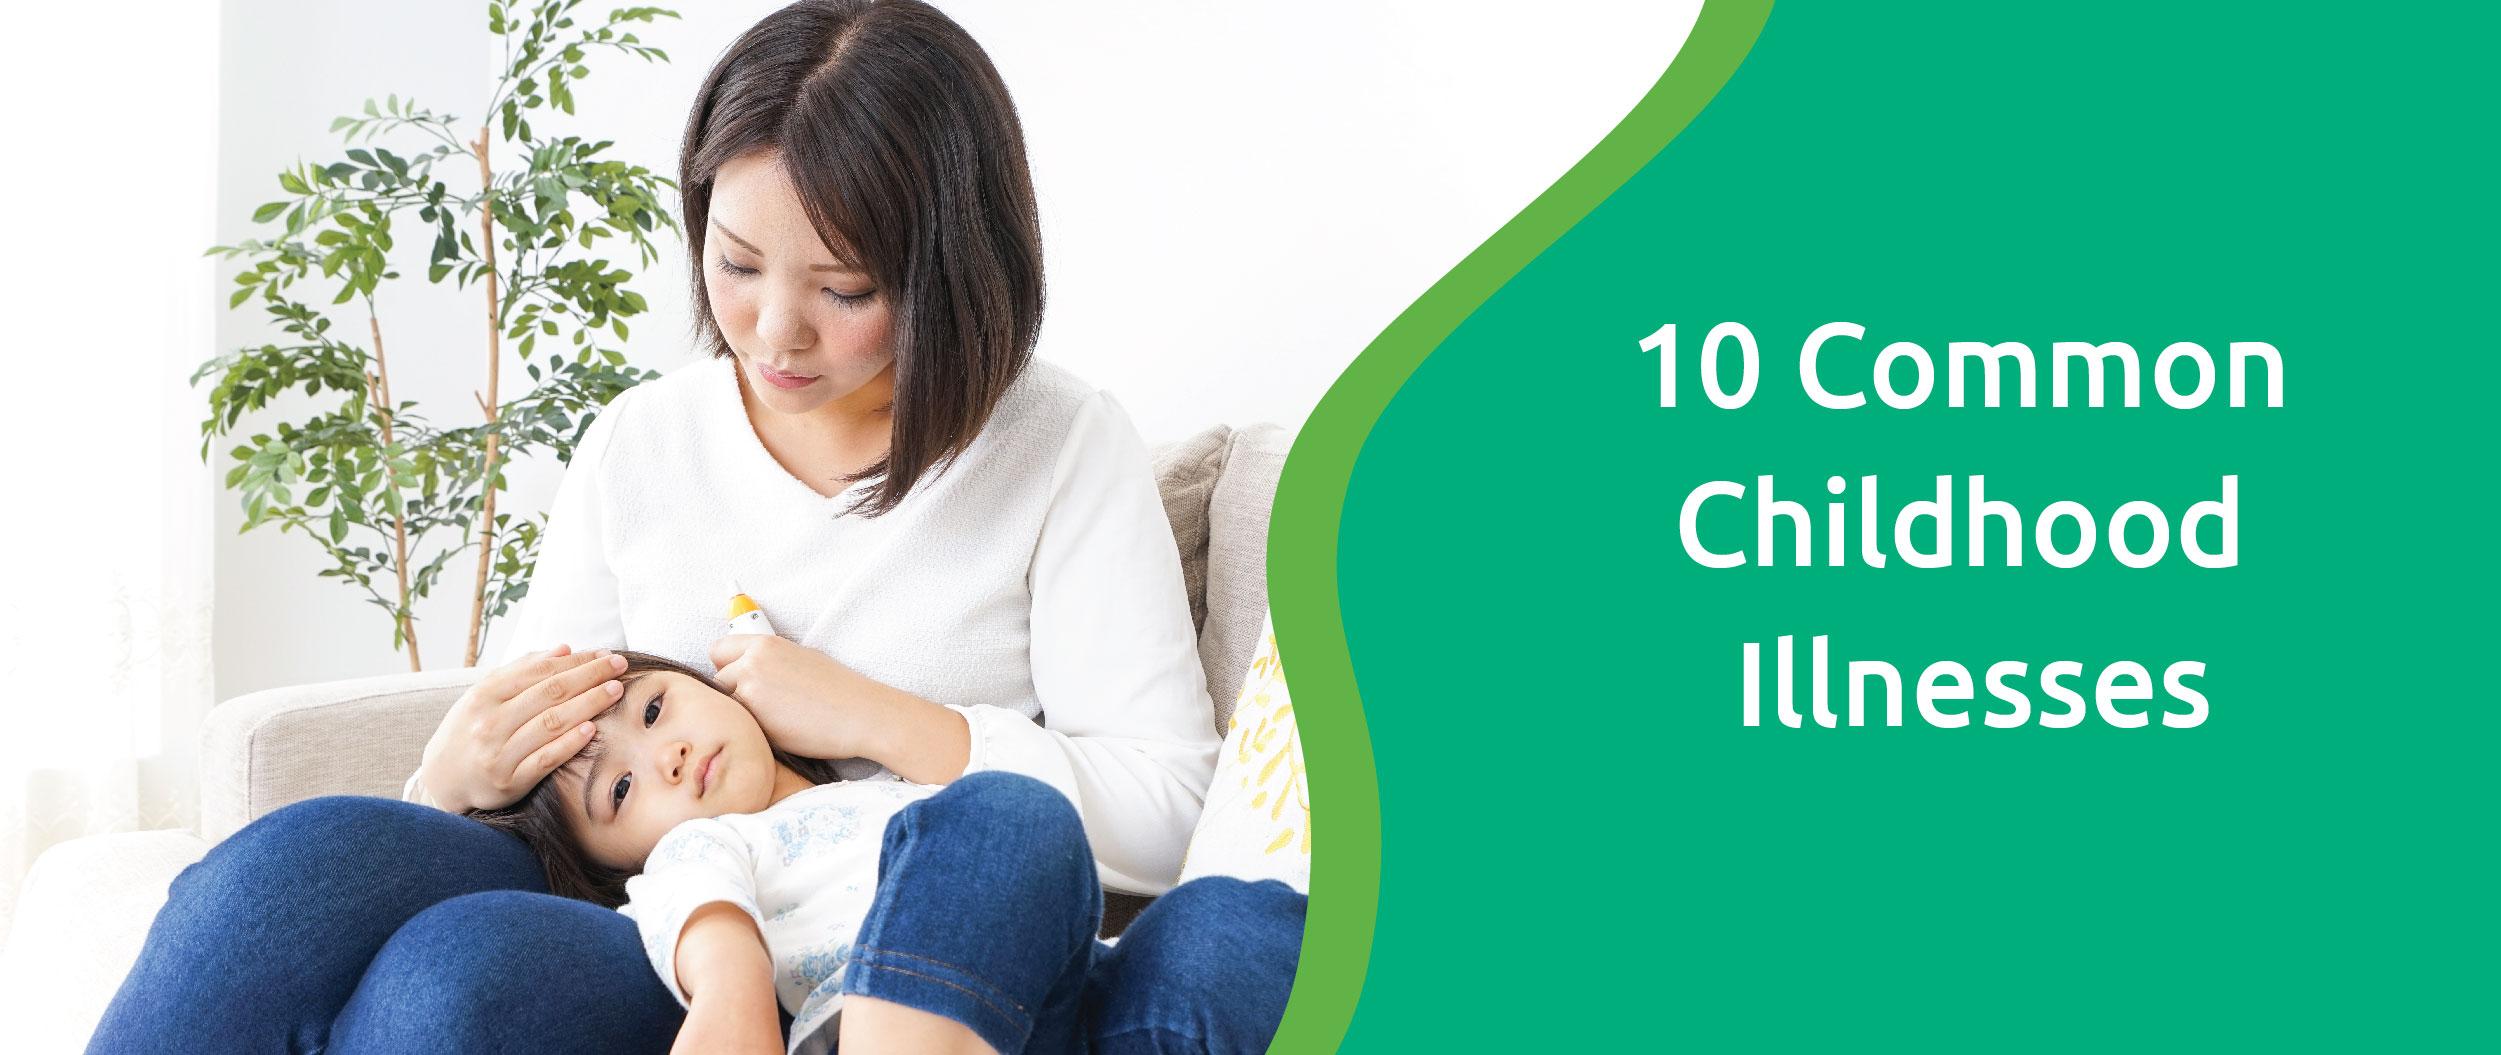 10 common childhood illnesses